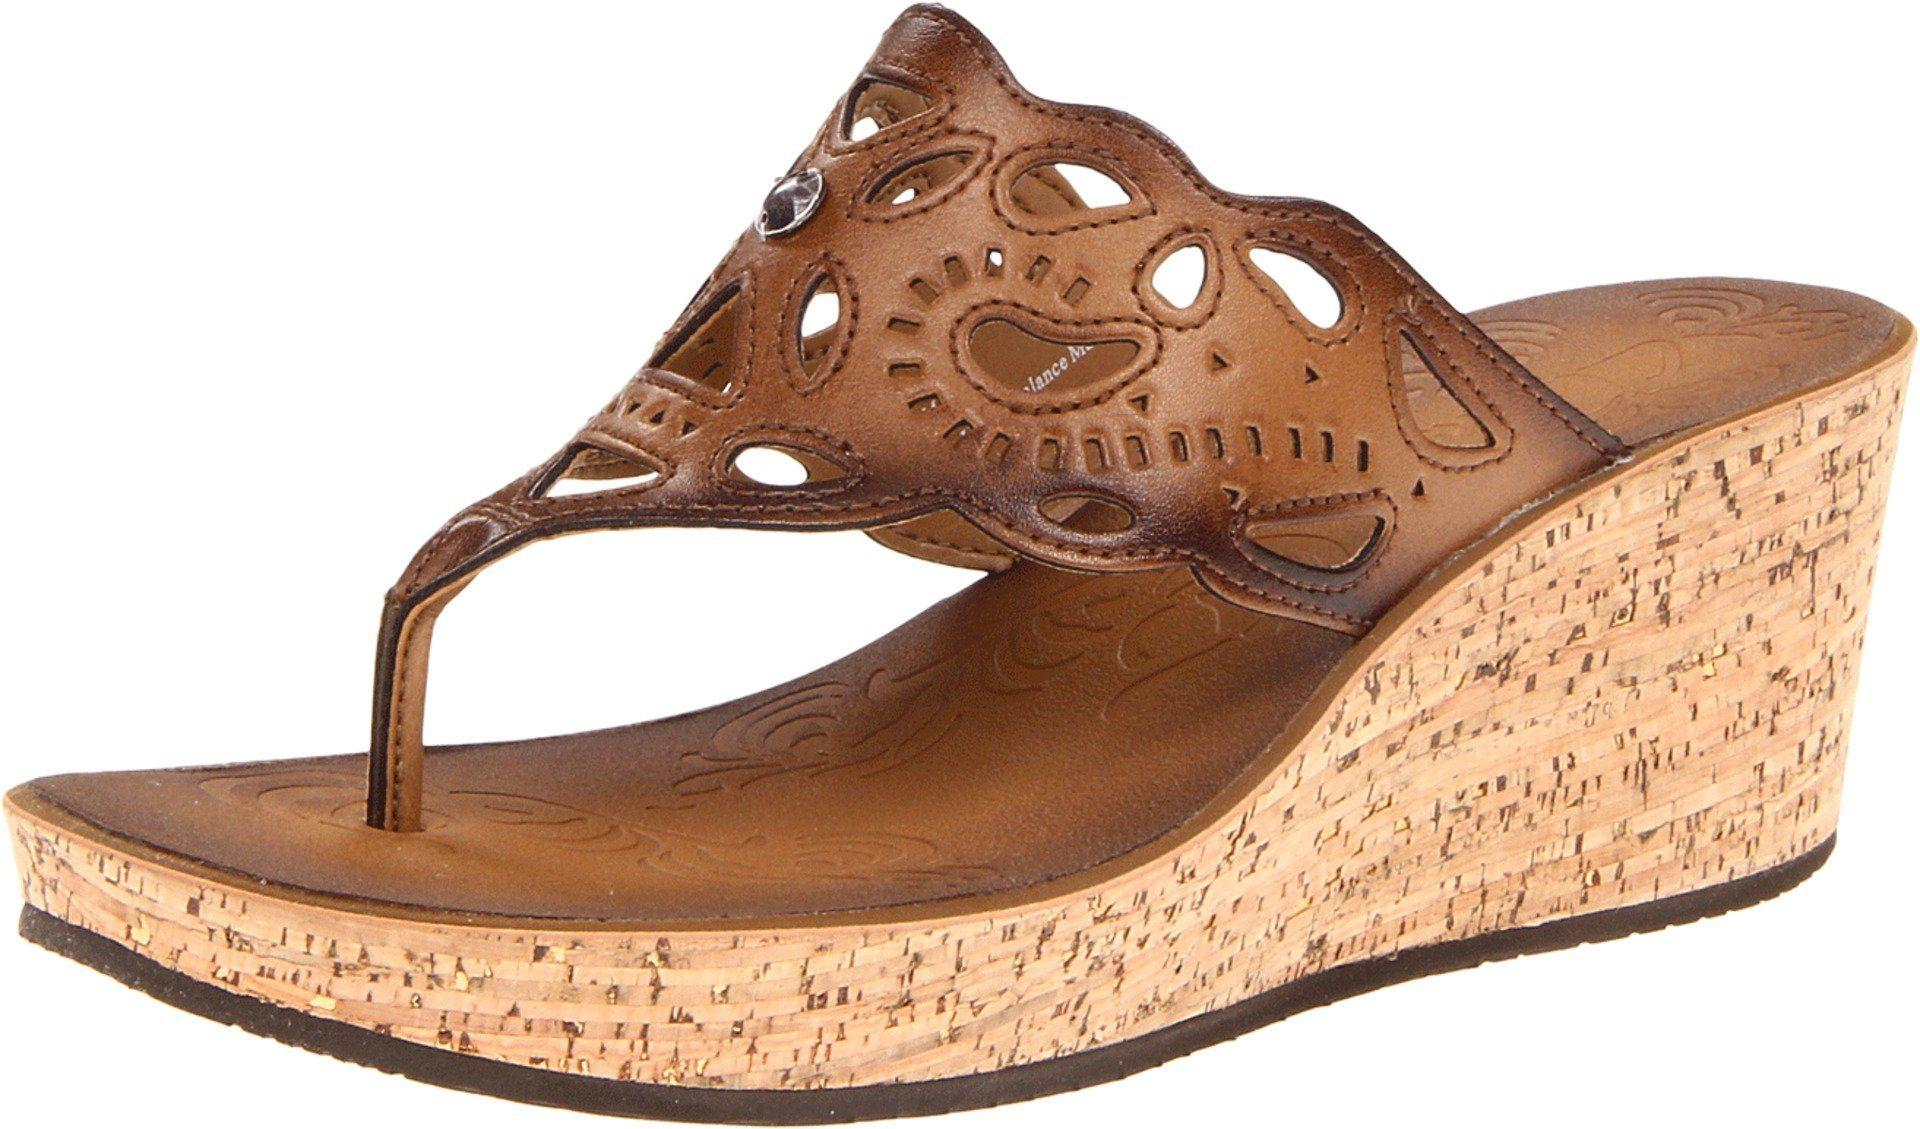 27337a6f715f Cute wedge sandal by Clark s. Clarks Women s Clarks Mimmey Anne Thong Sandal